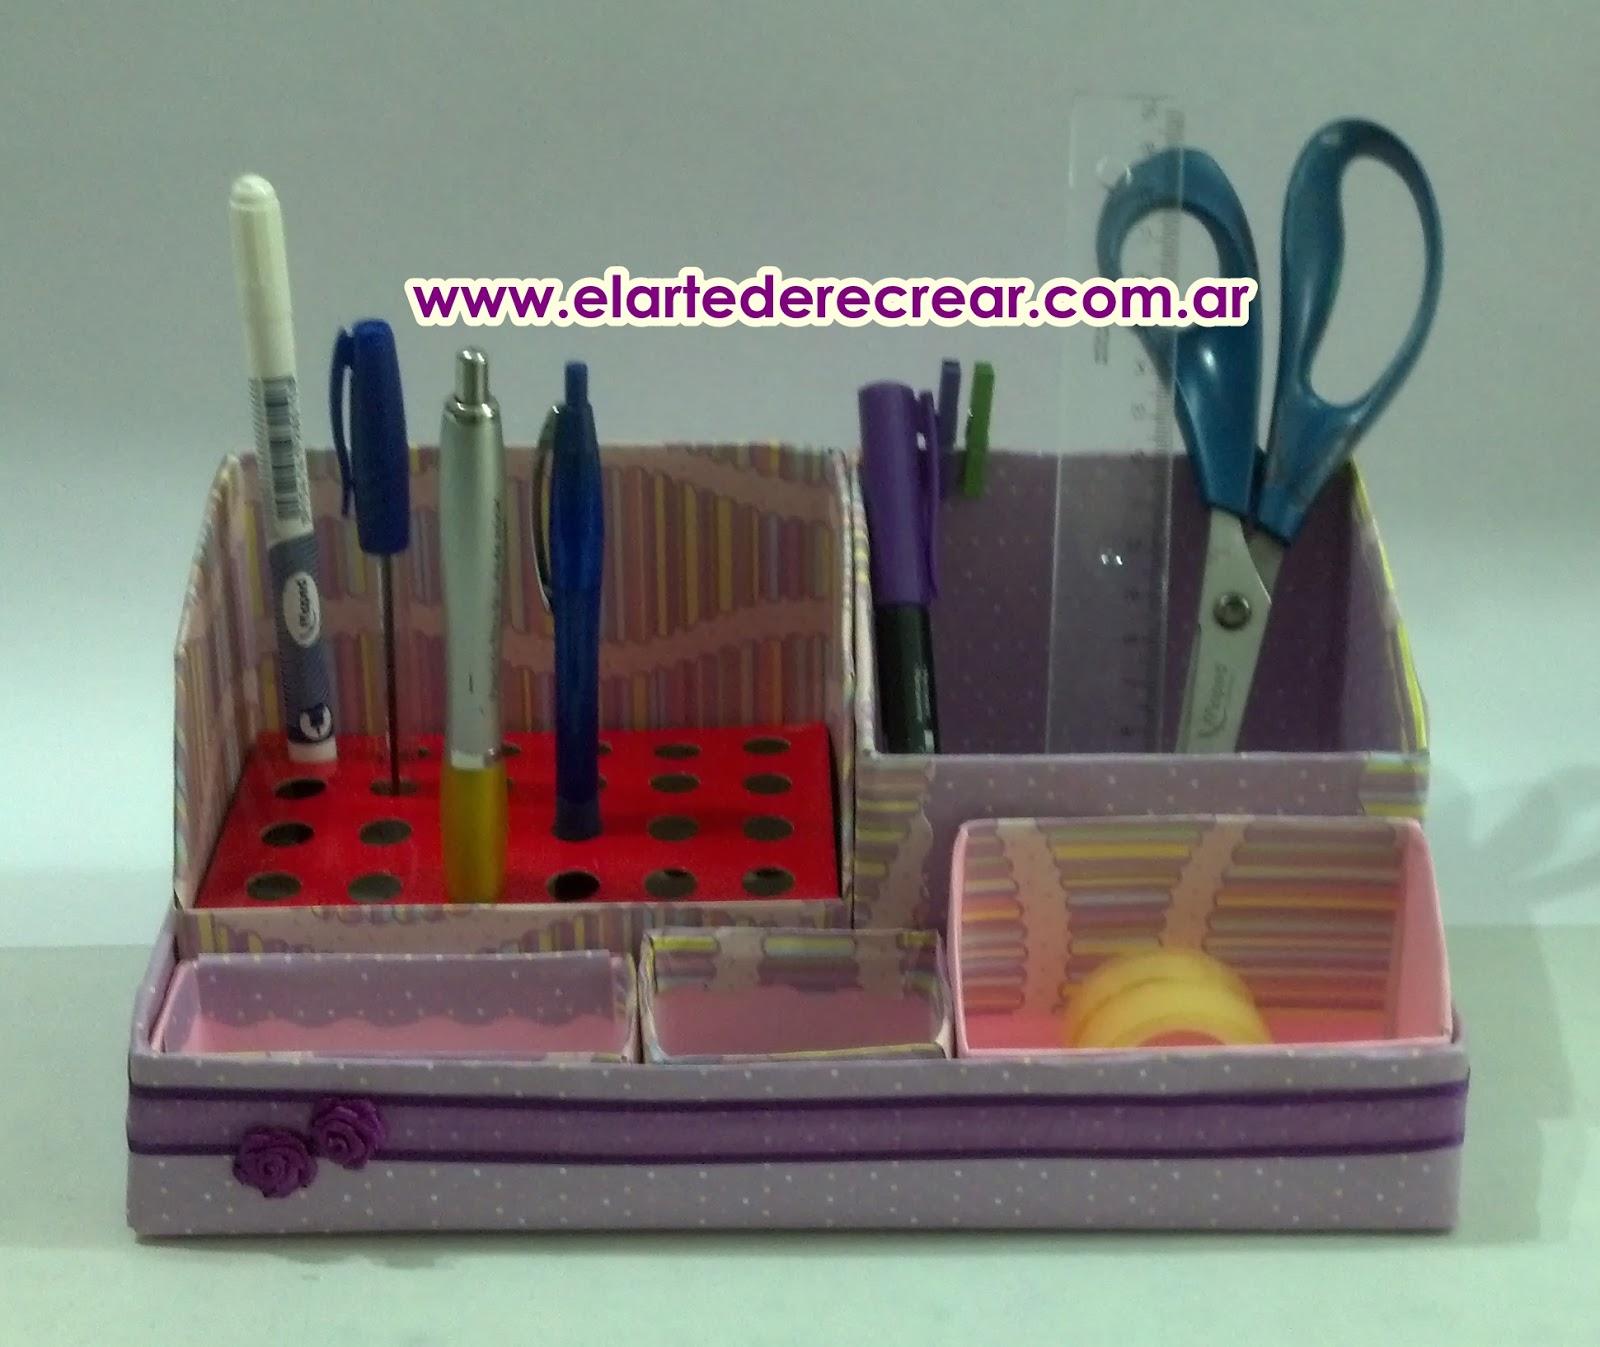 Organizador de escritorio casero con material reciclado de cart n recrear manualidades arte - Organizador de escritorio ...